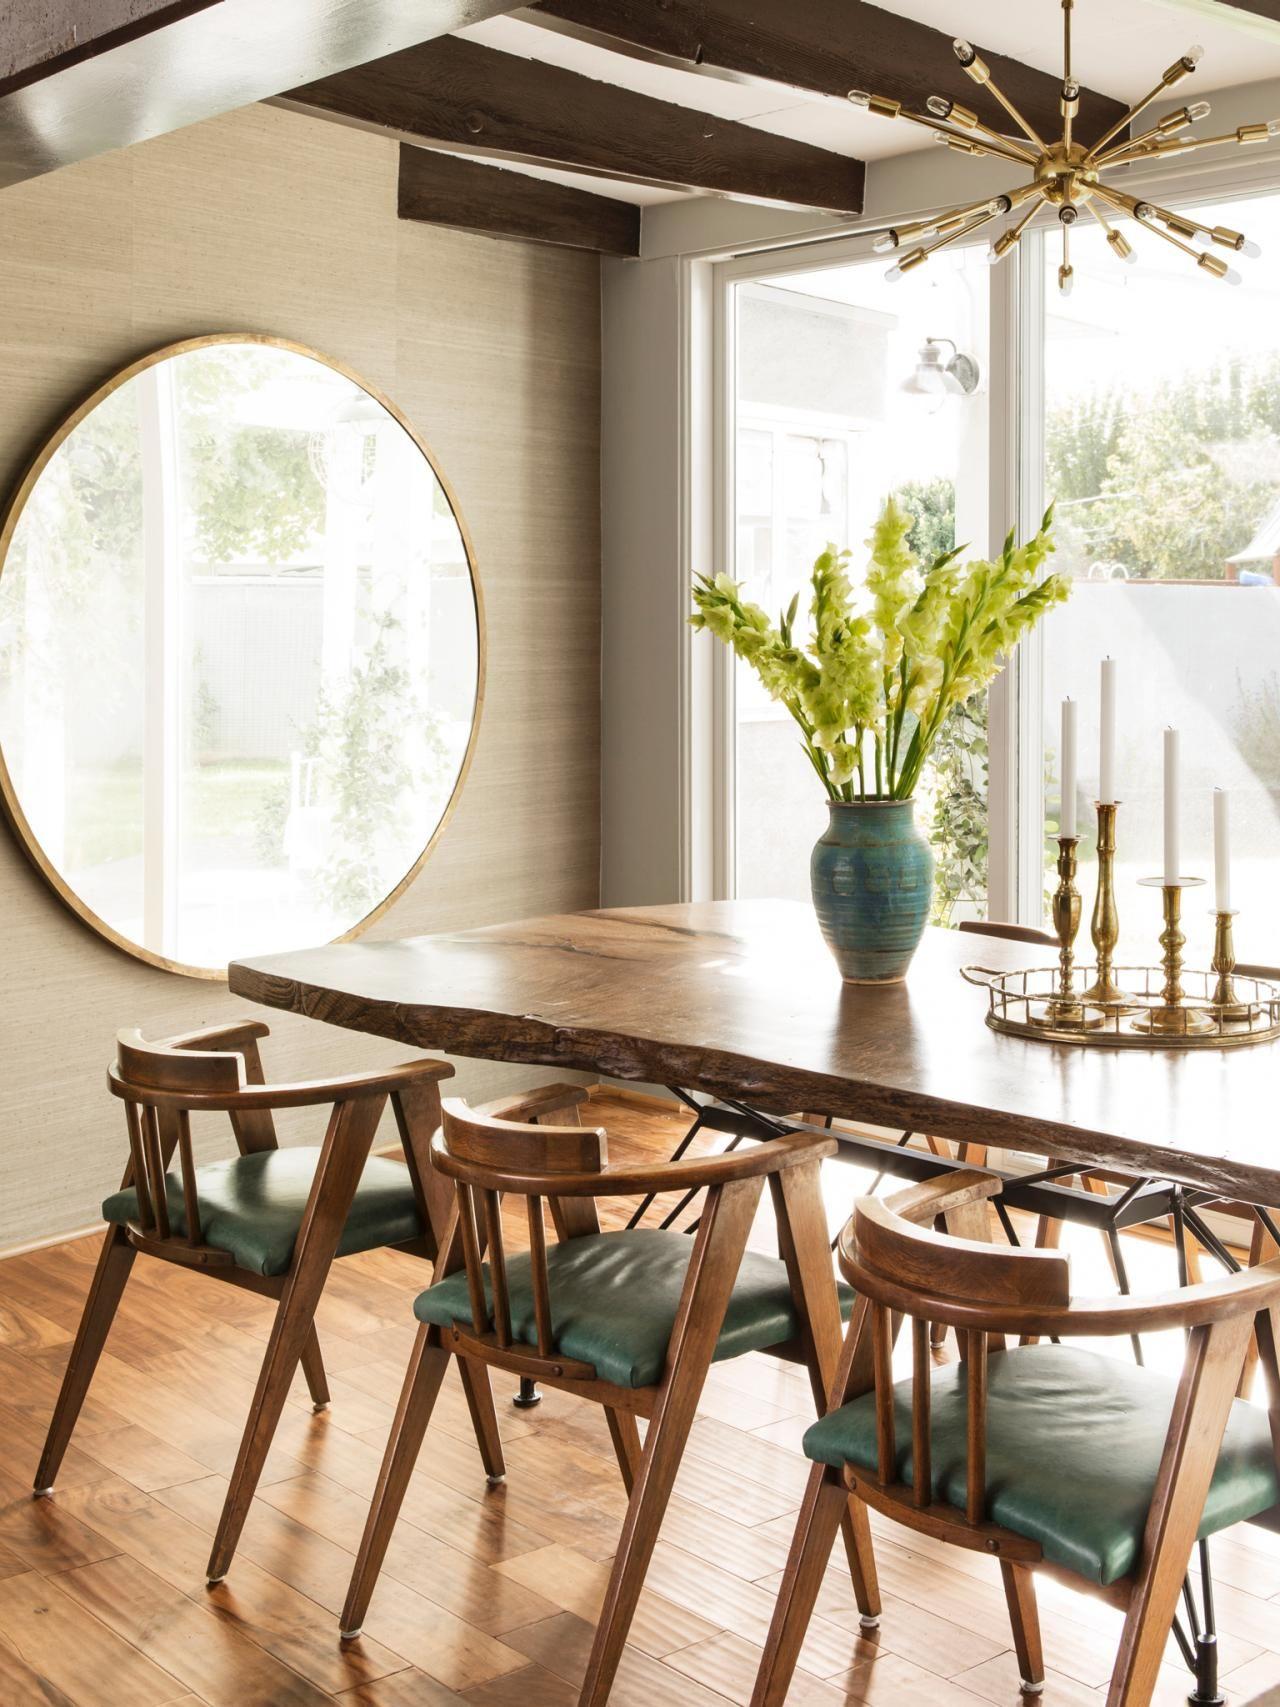 Mid Centry Modern Decorating Ideas Mid Century Modern Dining Room Mid Century Dining Room Tables Mid Century Dining Room